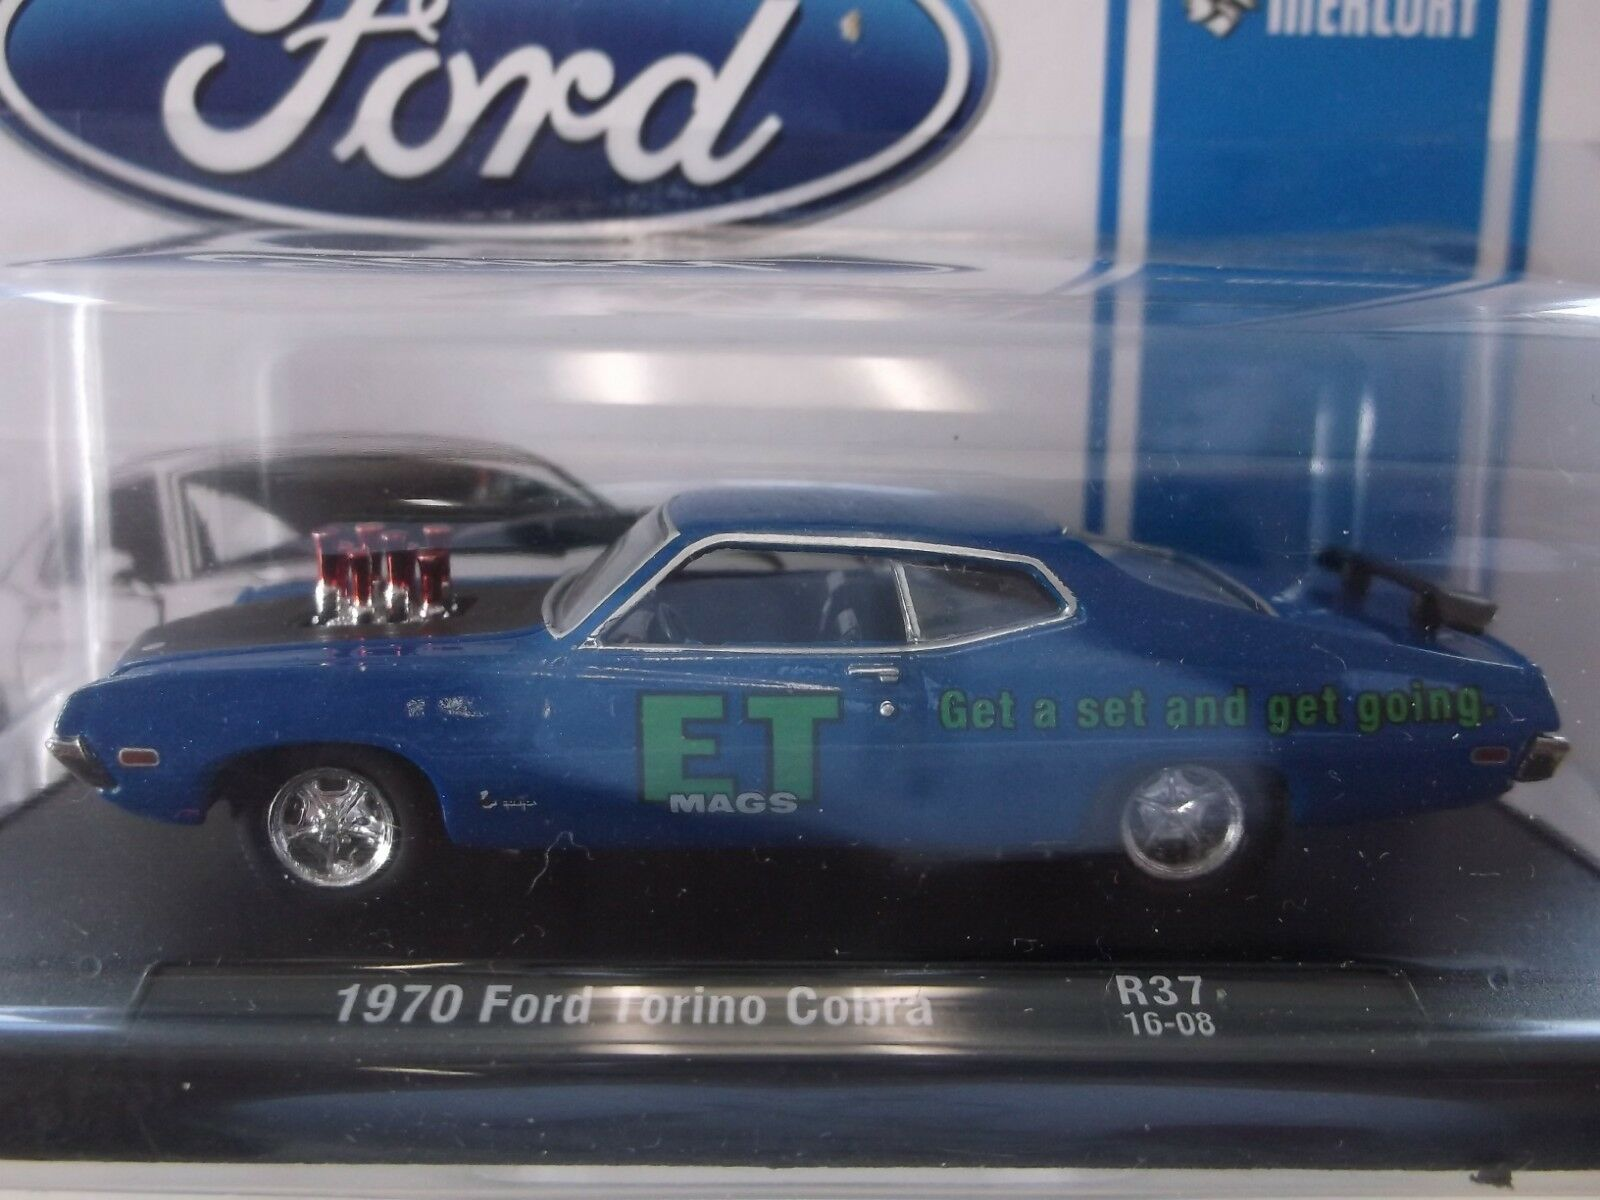 1970 Ford Torino Cobra New American Hot Rod Auto Drivers M2 Machines